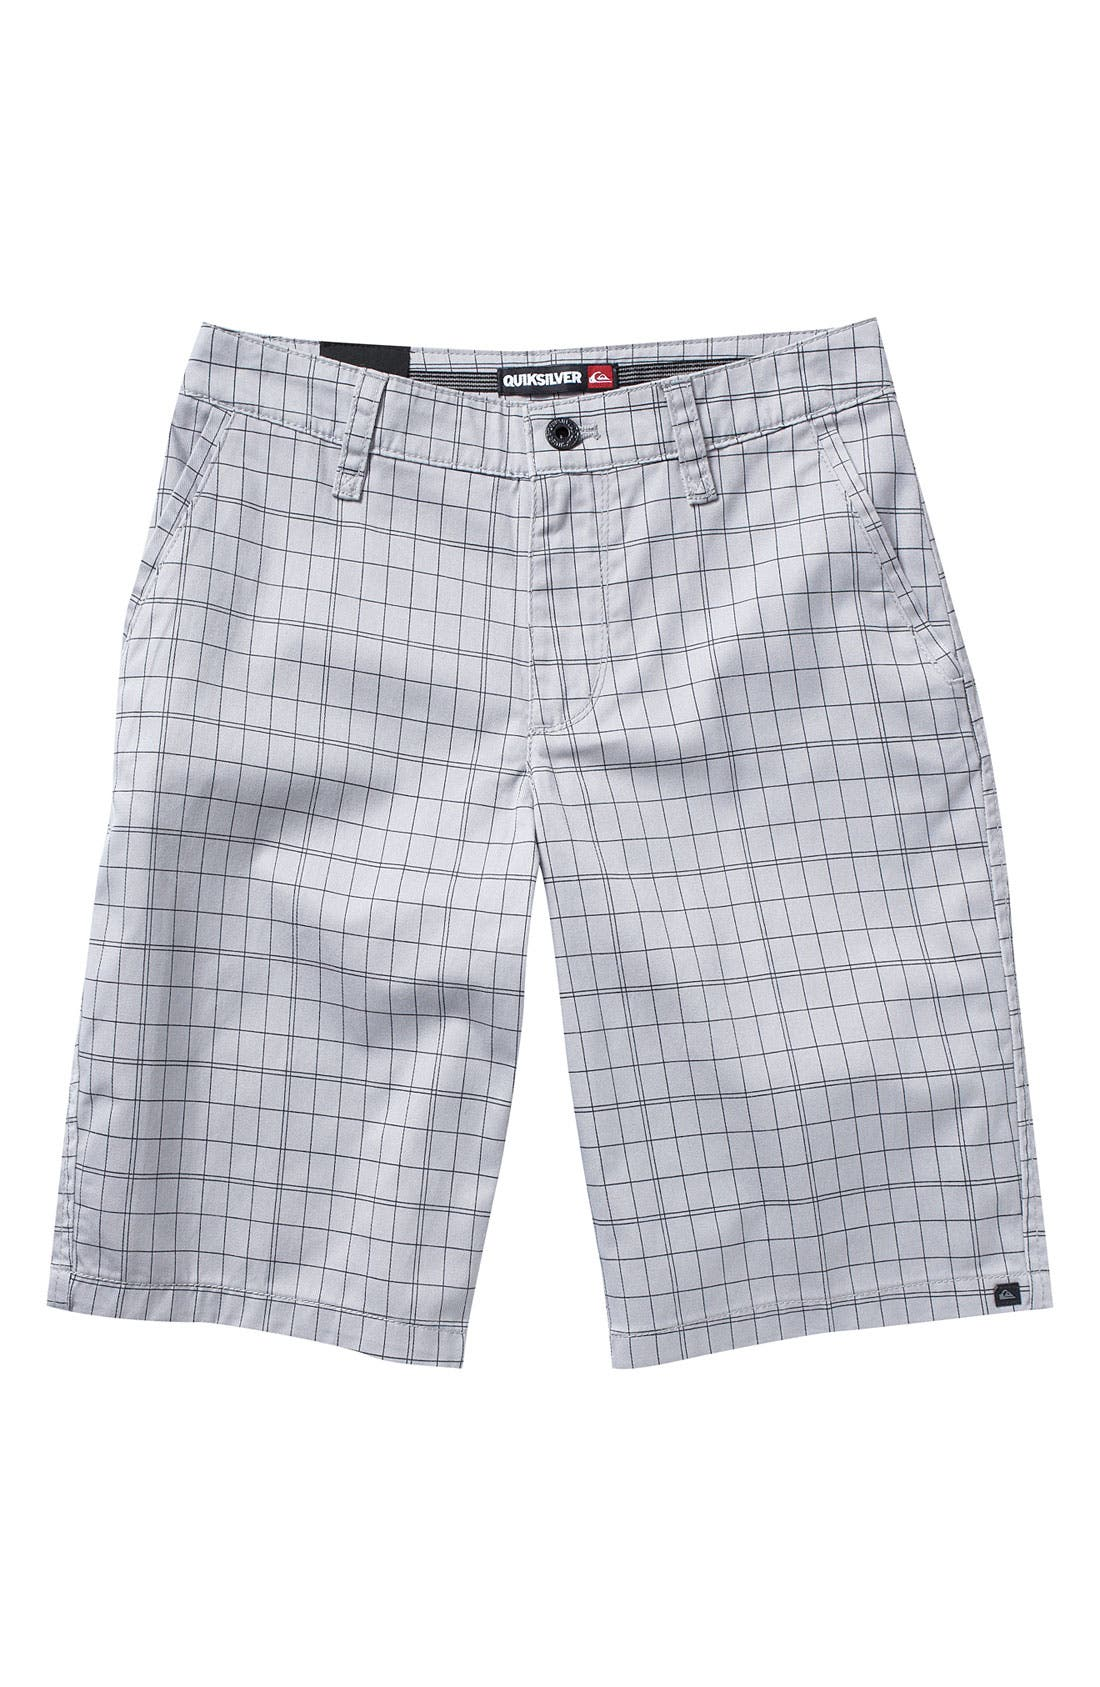 Alternate Image 1 Selected - Quiksilver 'Nuno' Shorts (Little Boys)